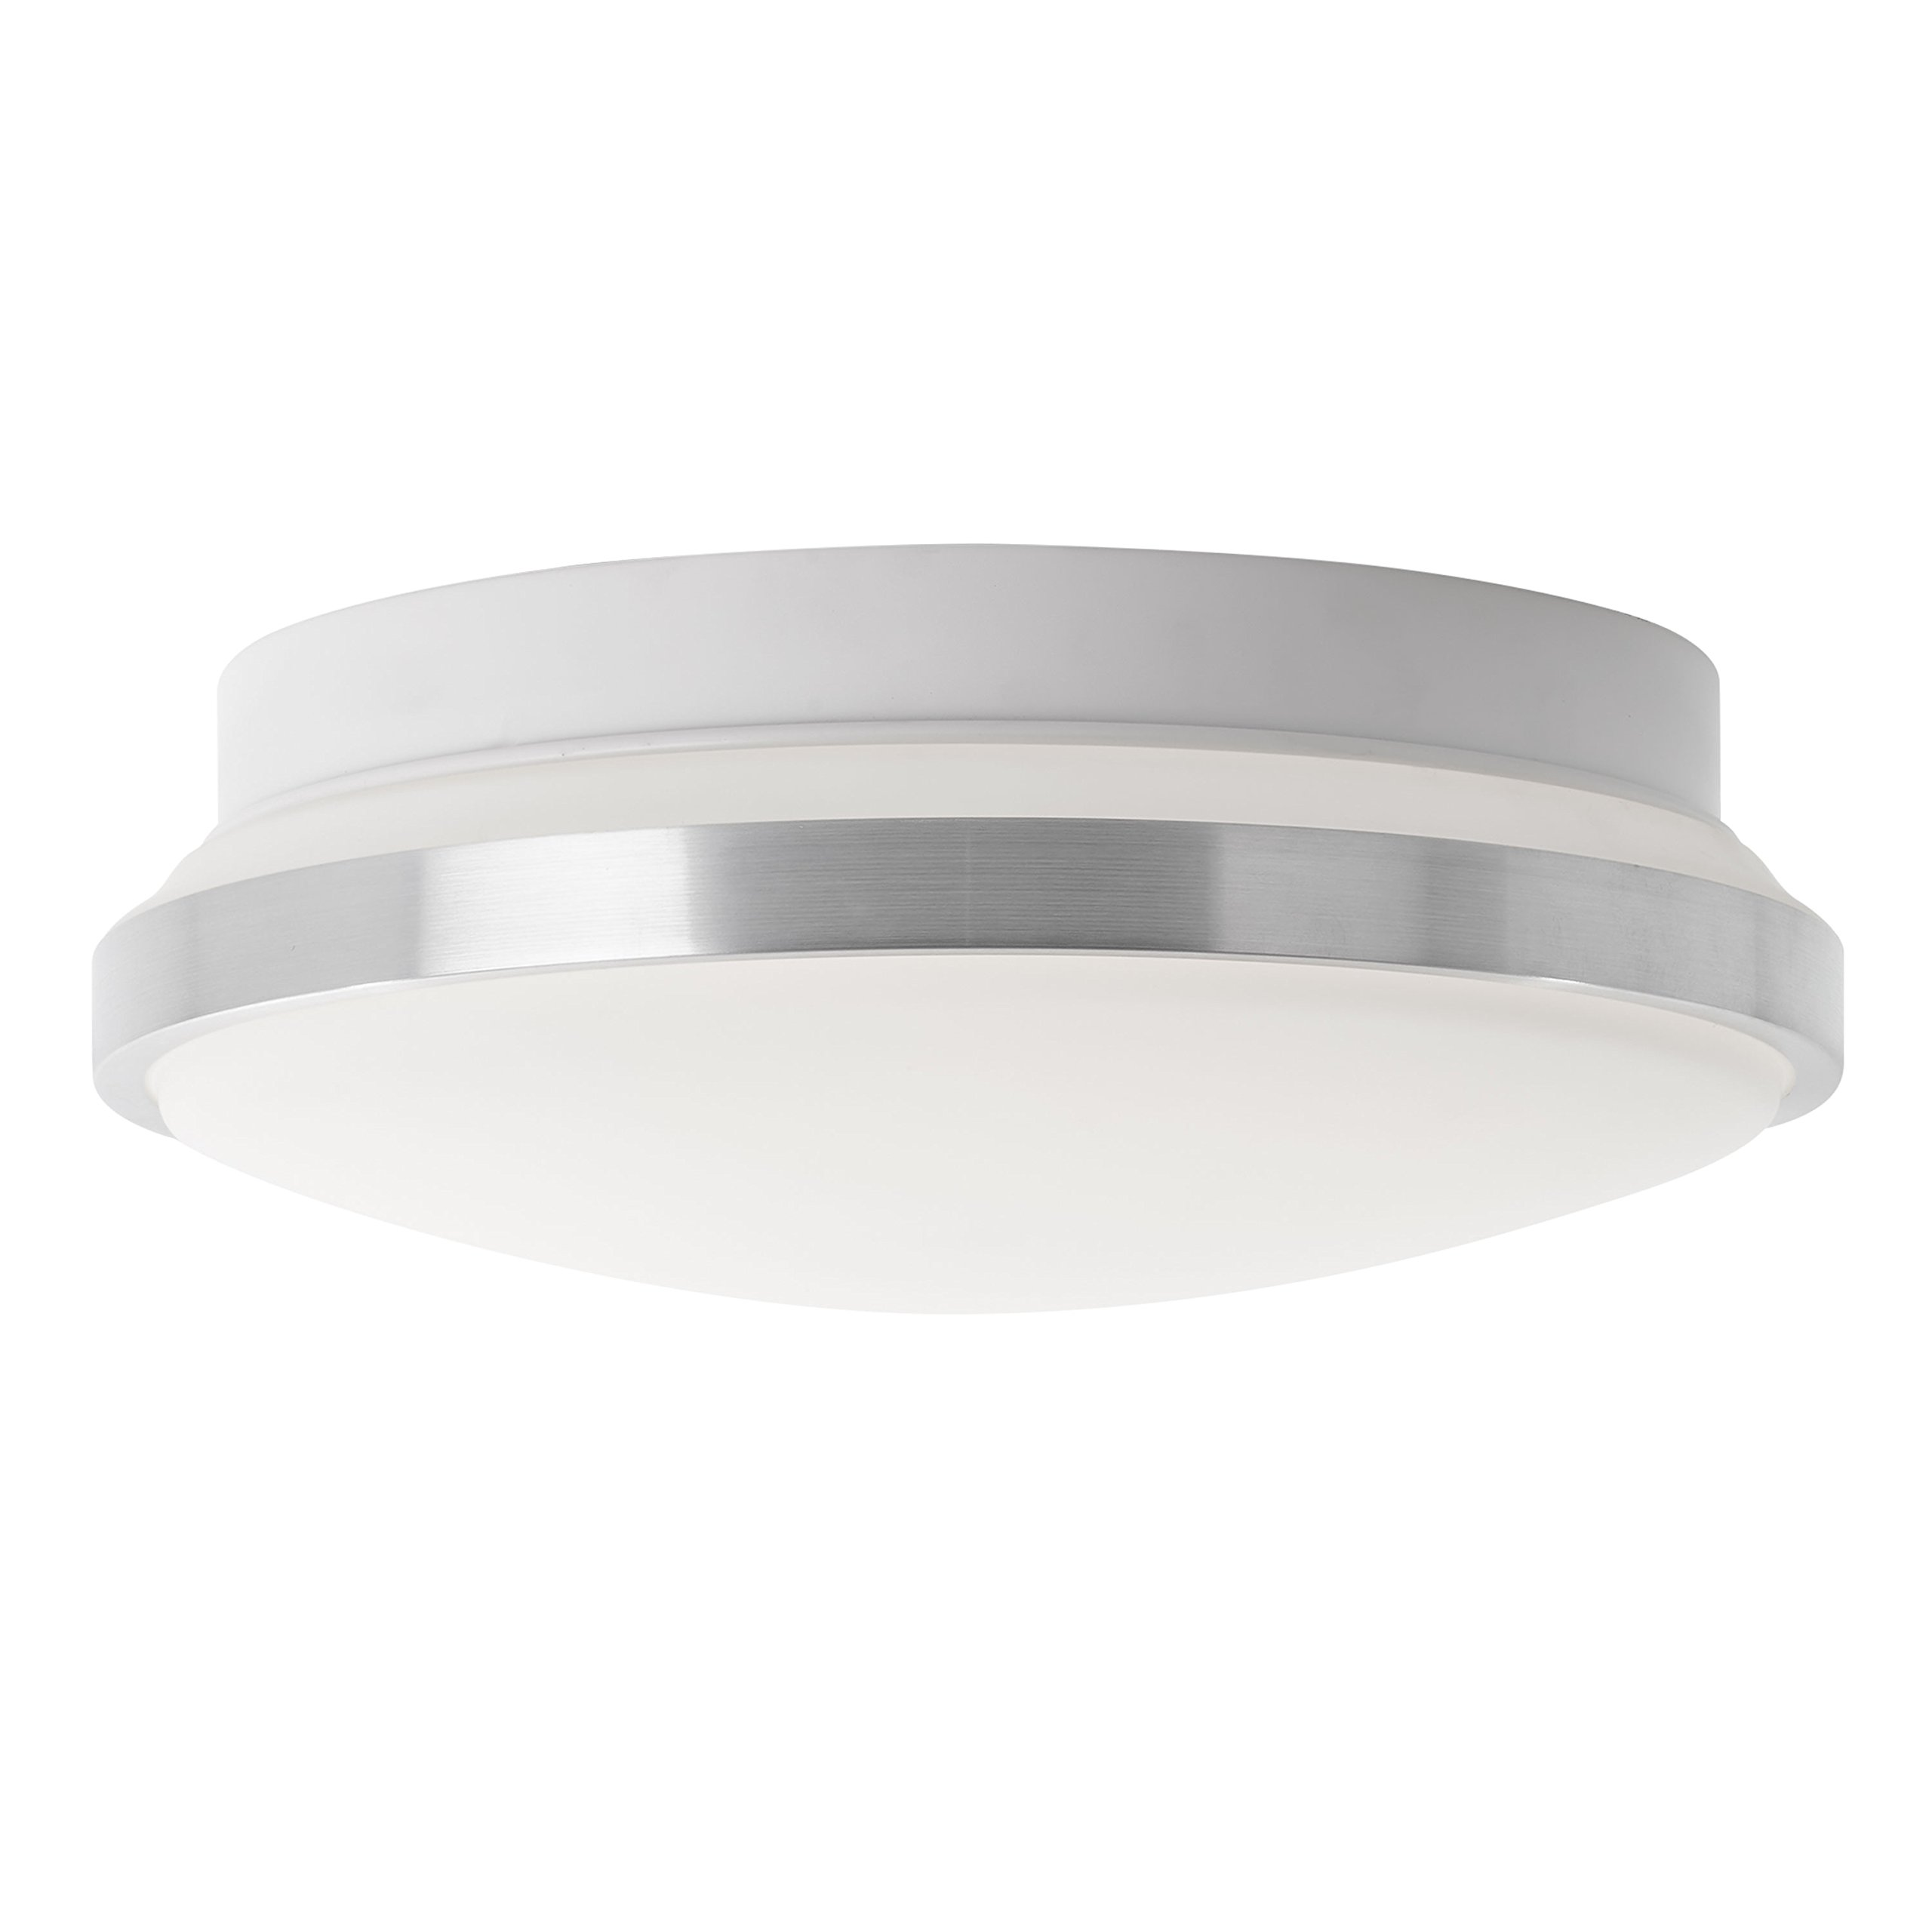 Artika AMP112-CCOM Moonraker 60 Led, 12'' Flush Mount Ceiling Light Fixture with Dimmable Light, Chrome Finish